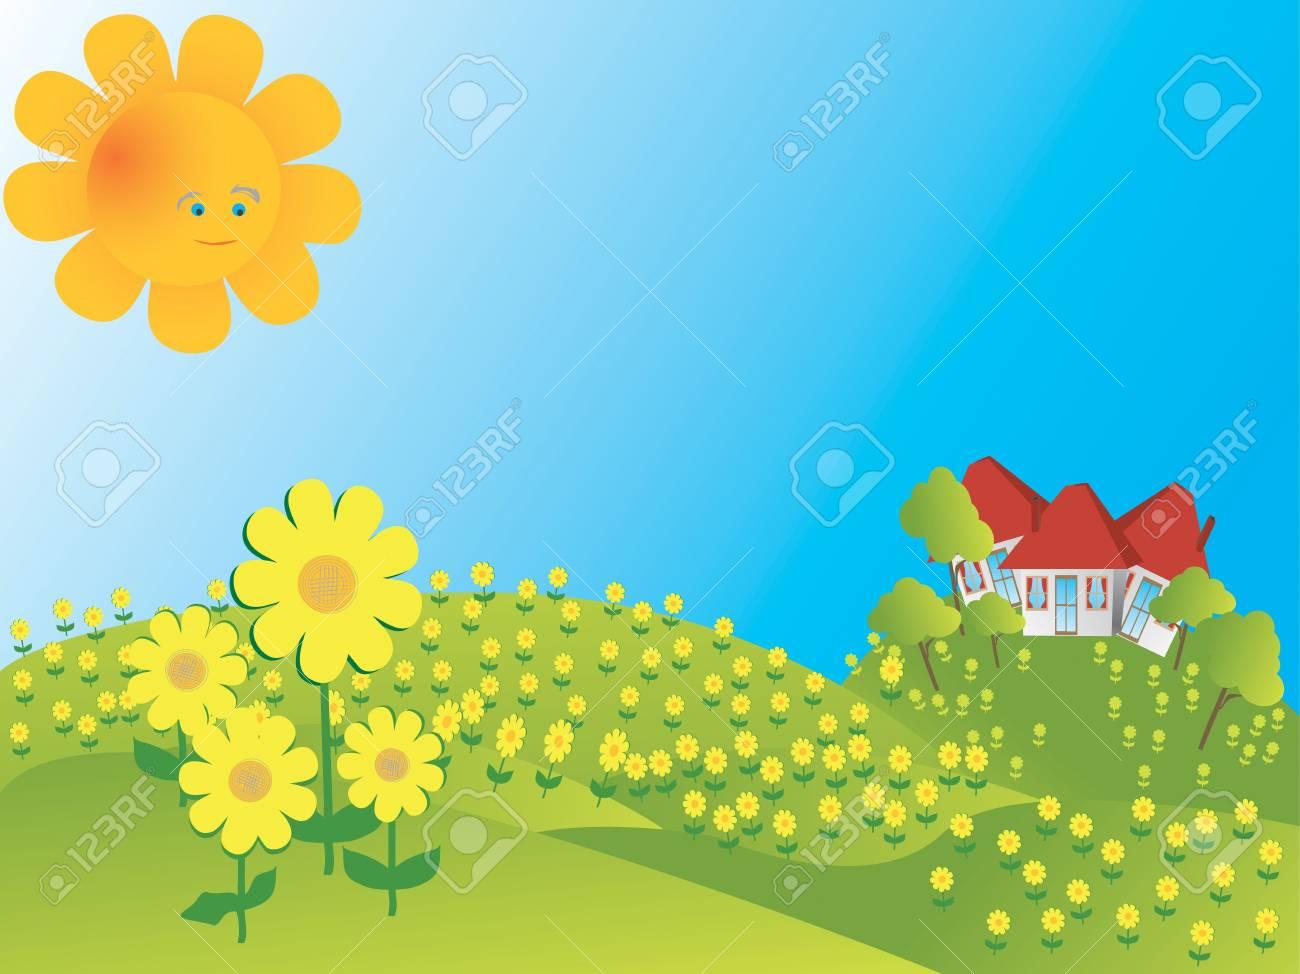 Background illustration with sunflowers Stock Illustration - 7072429